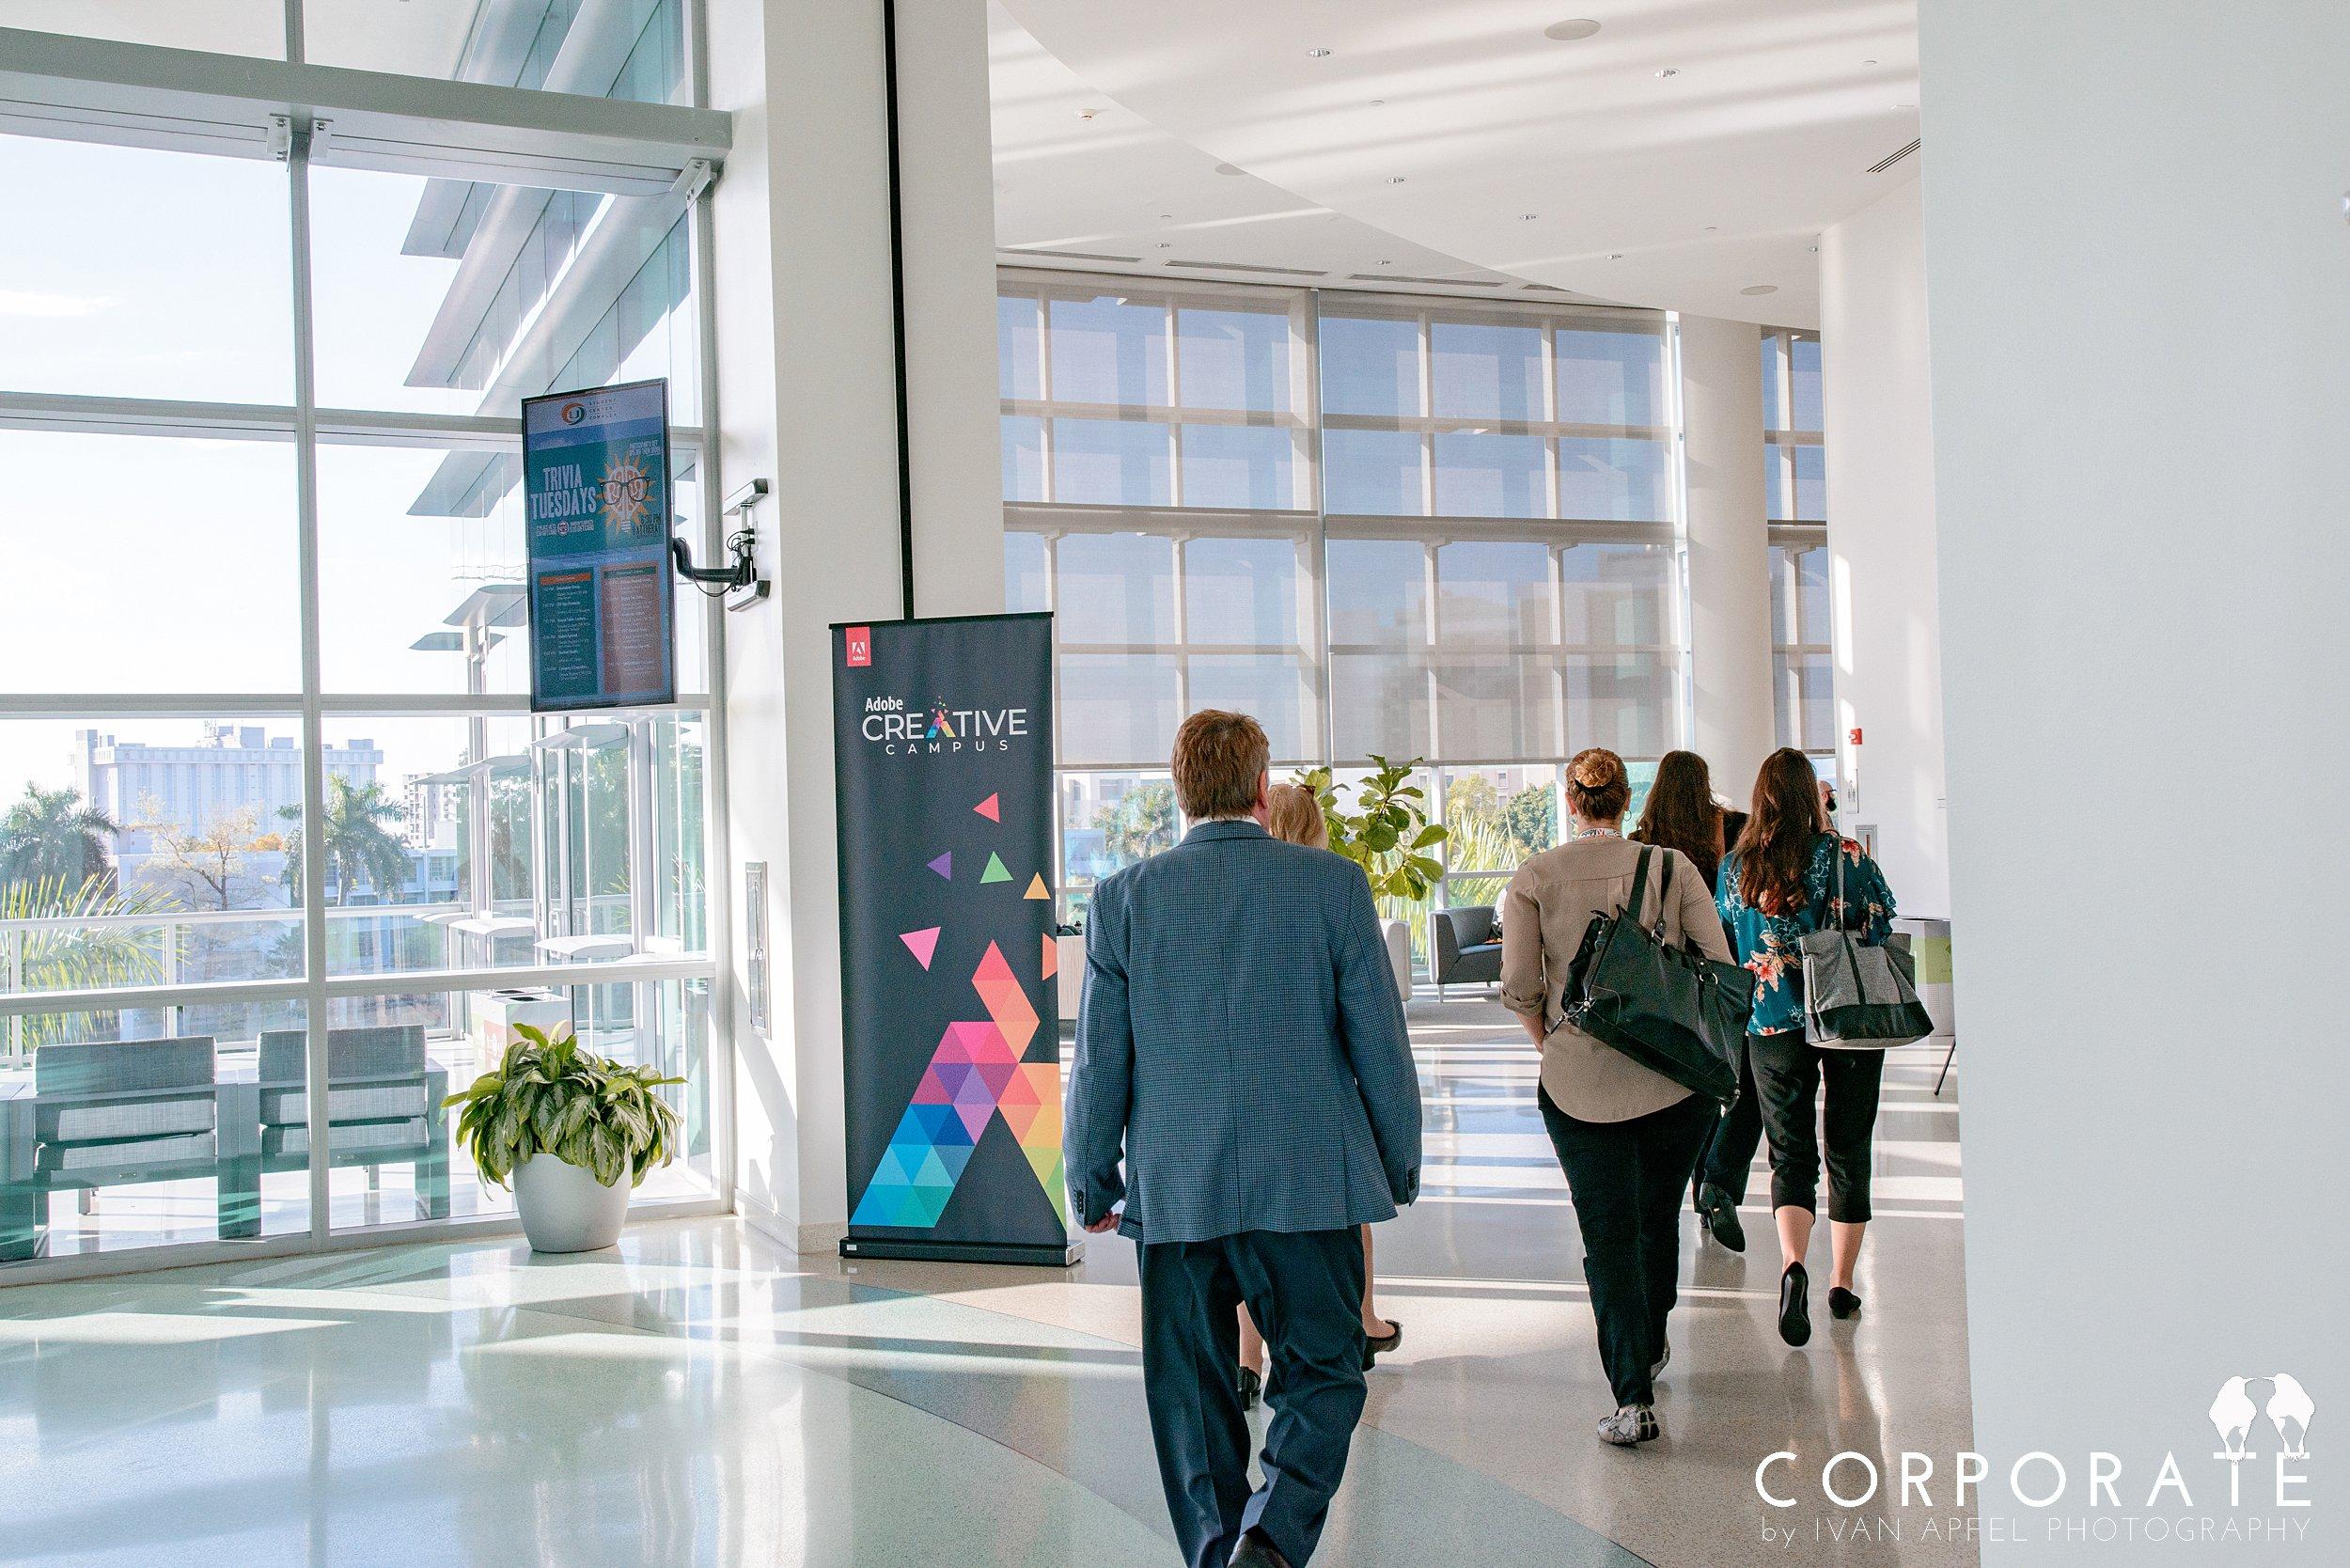 Miami Corporate Event Photographer Adobe Systems Creative Campus 2019-D2_Adobe_Creative_Campus_UMiami-_IAP8249.jpg